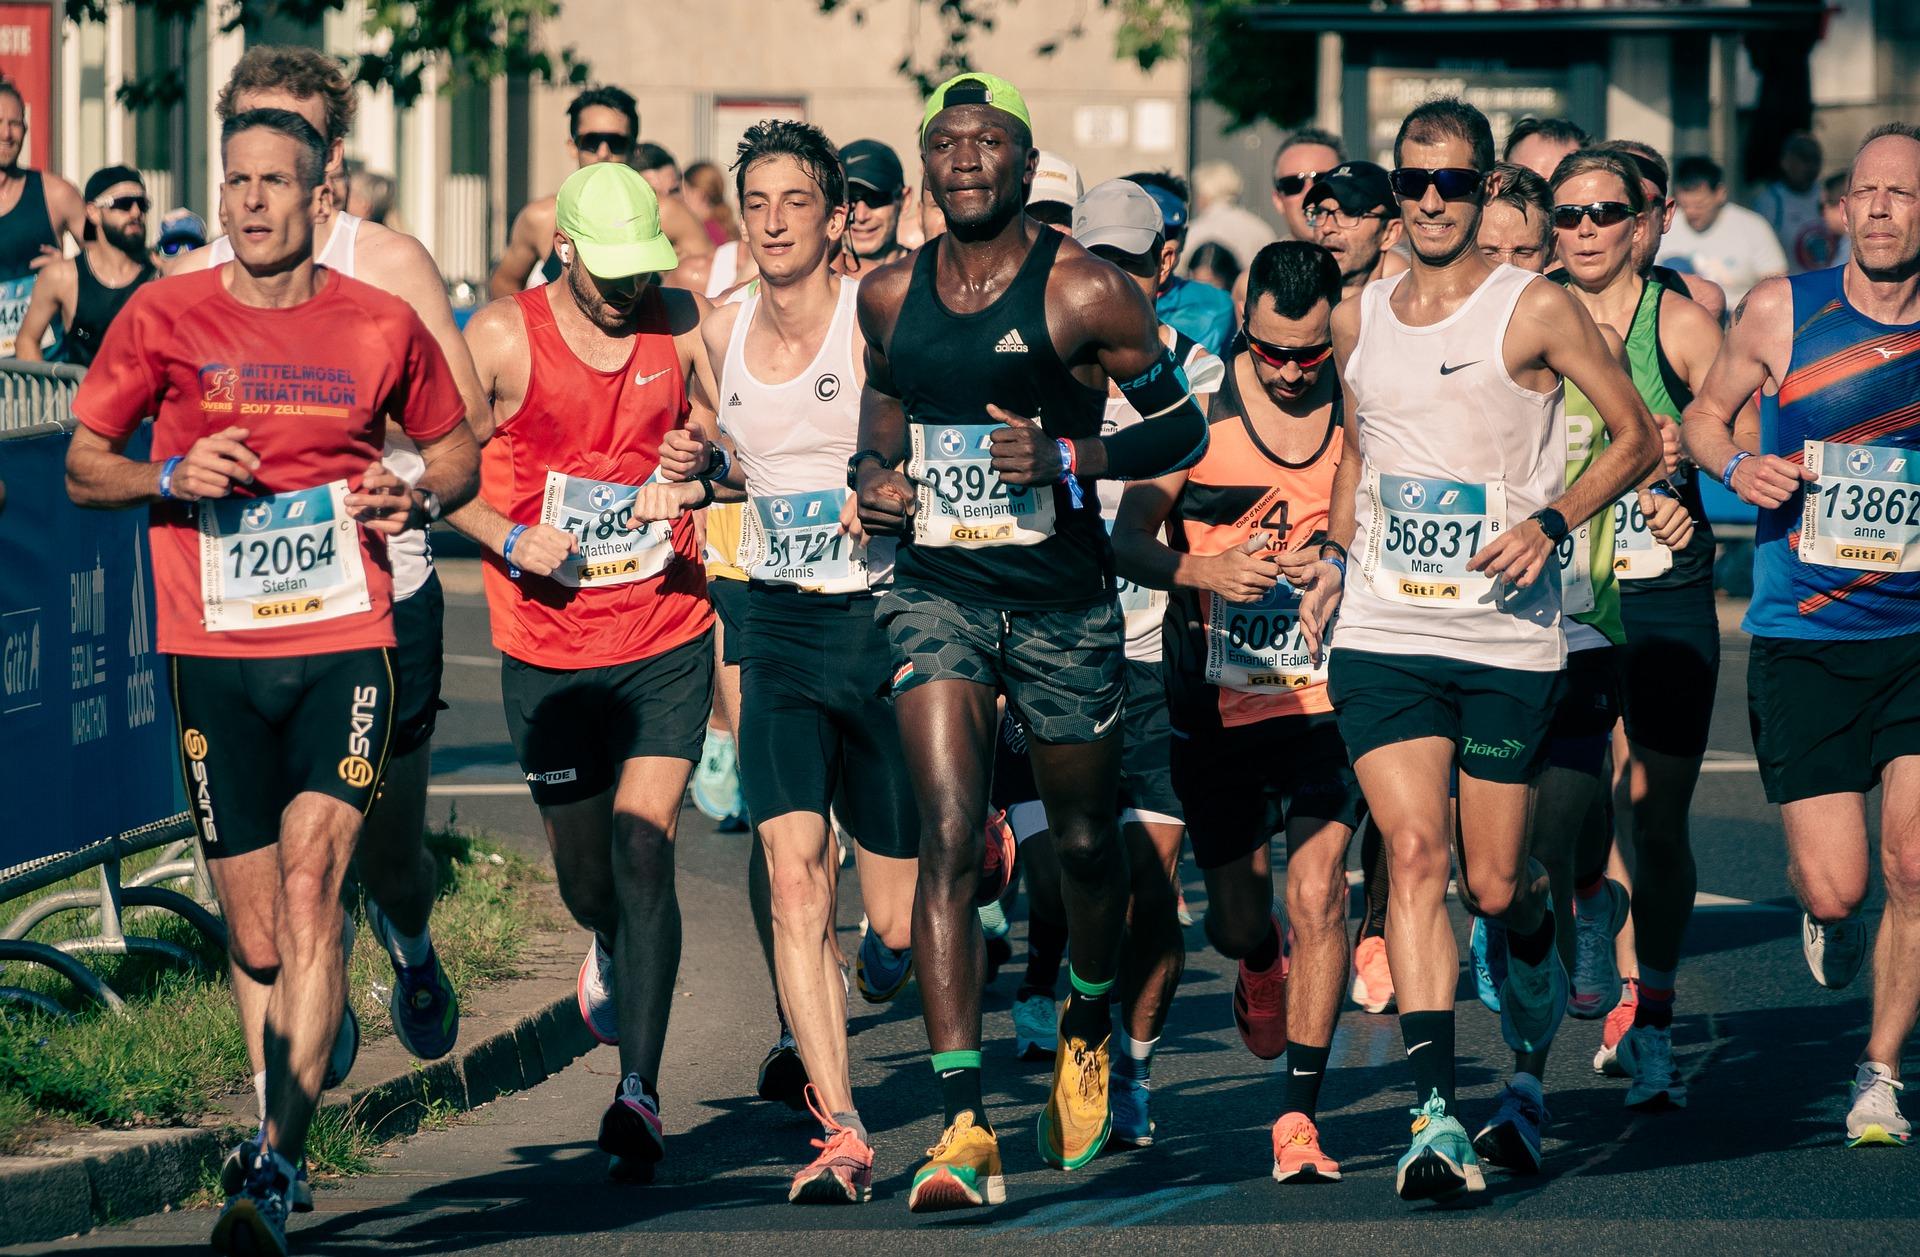 marathon-6660180_1920